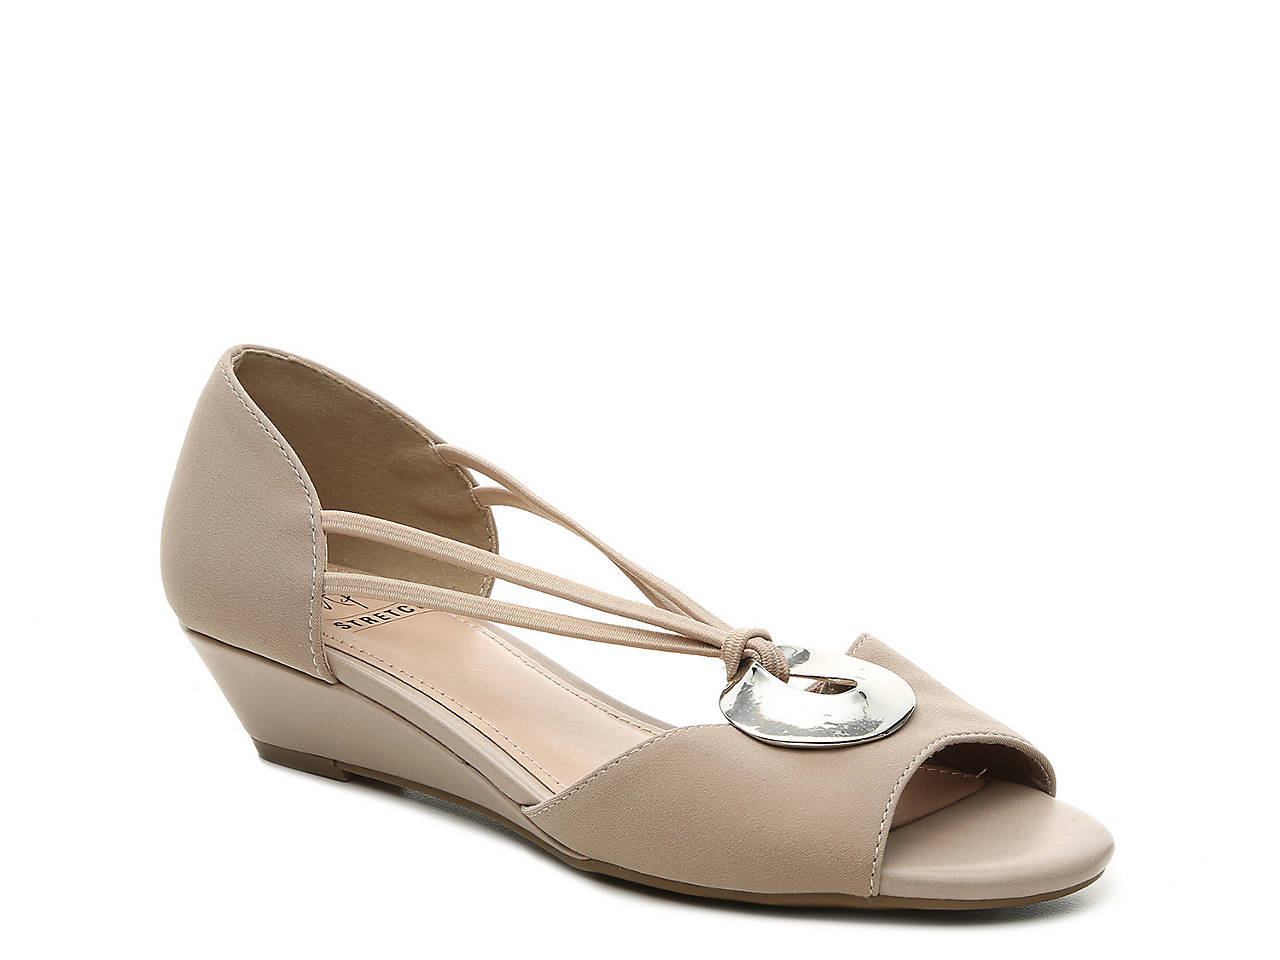 3f42530ff3df6 Impo Regie Wedge Sandal Women s Shoes